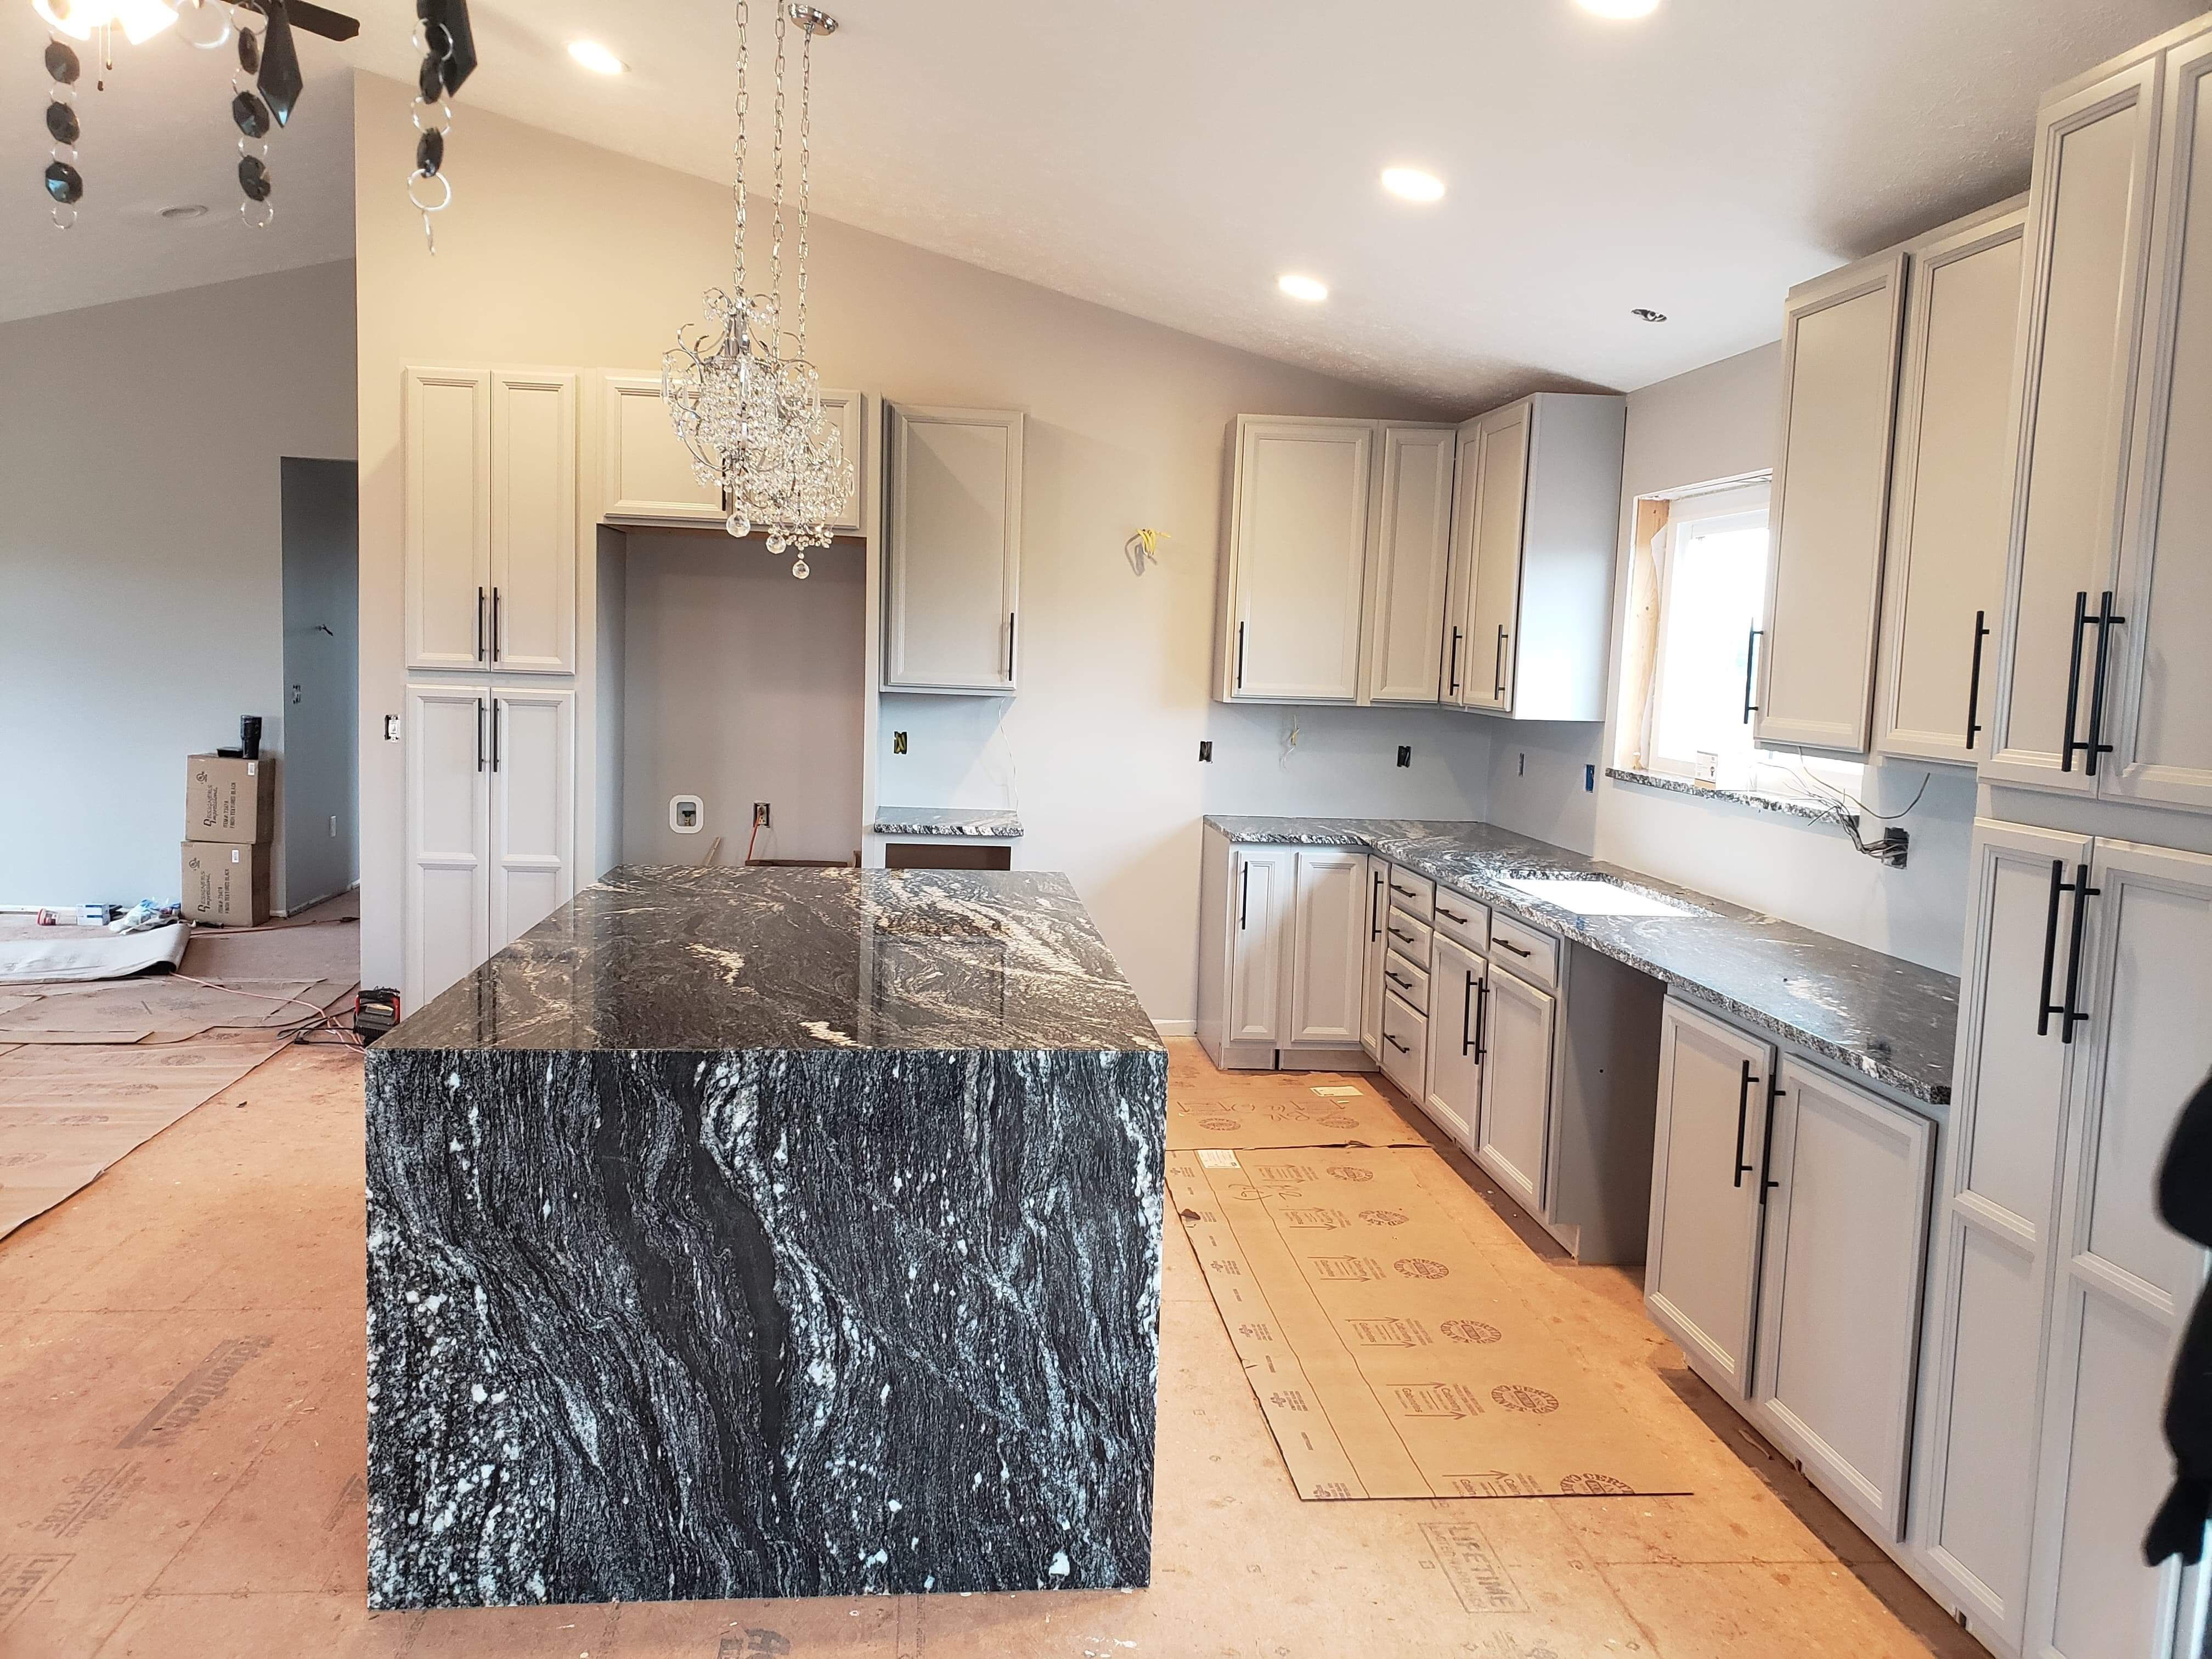 Waterfall Granite Island Countertop New Construction Black White And Gray Granite Kitchen Island Black Granite Kitchen Marble Kitchen Island